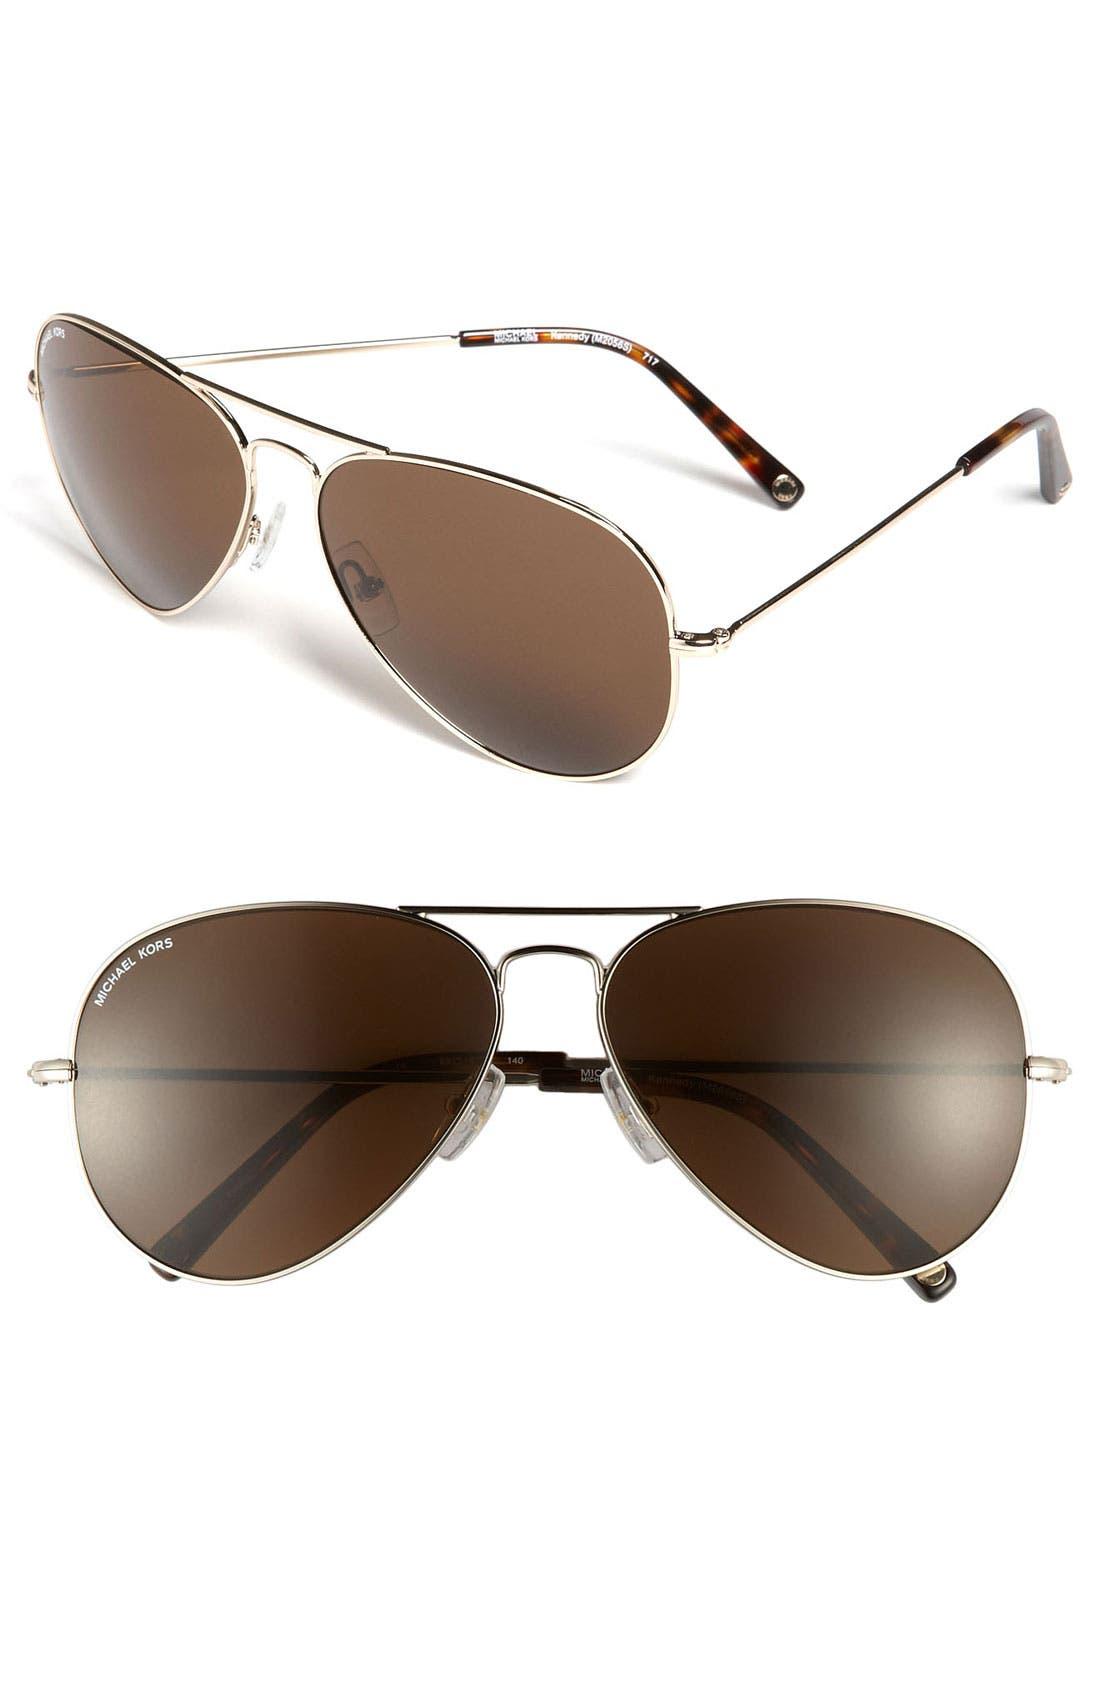 Alternate Image 1 Selected - MICHAEL Michael Kors 'Kennedy' 62mm Aviator Sunglasses